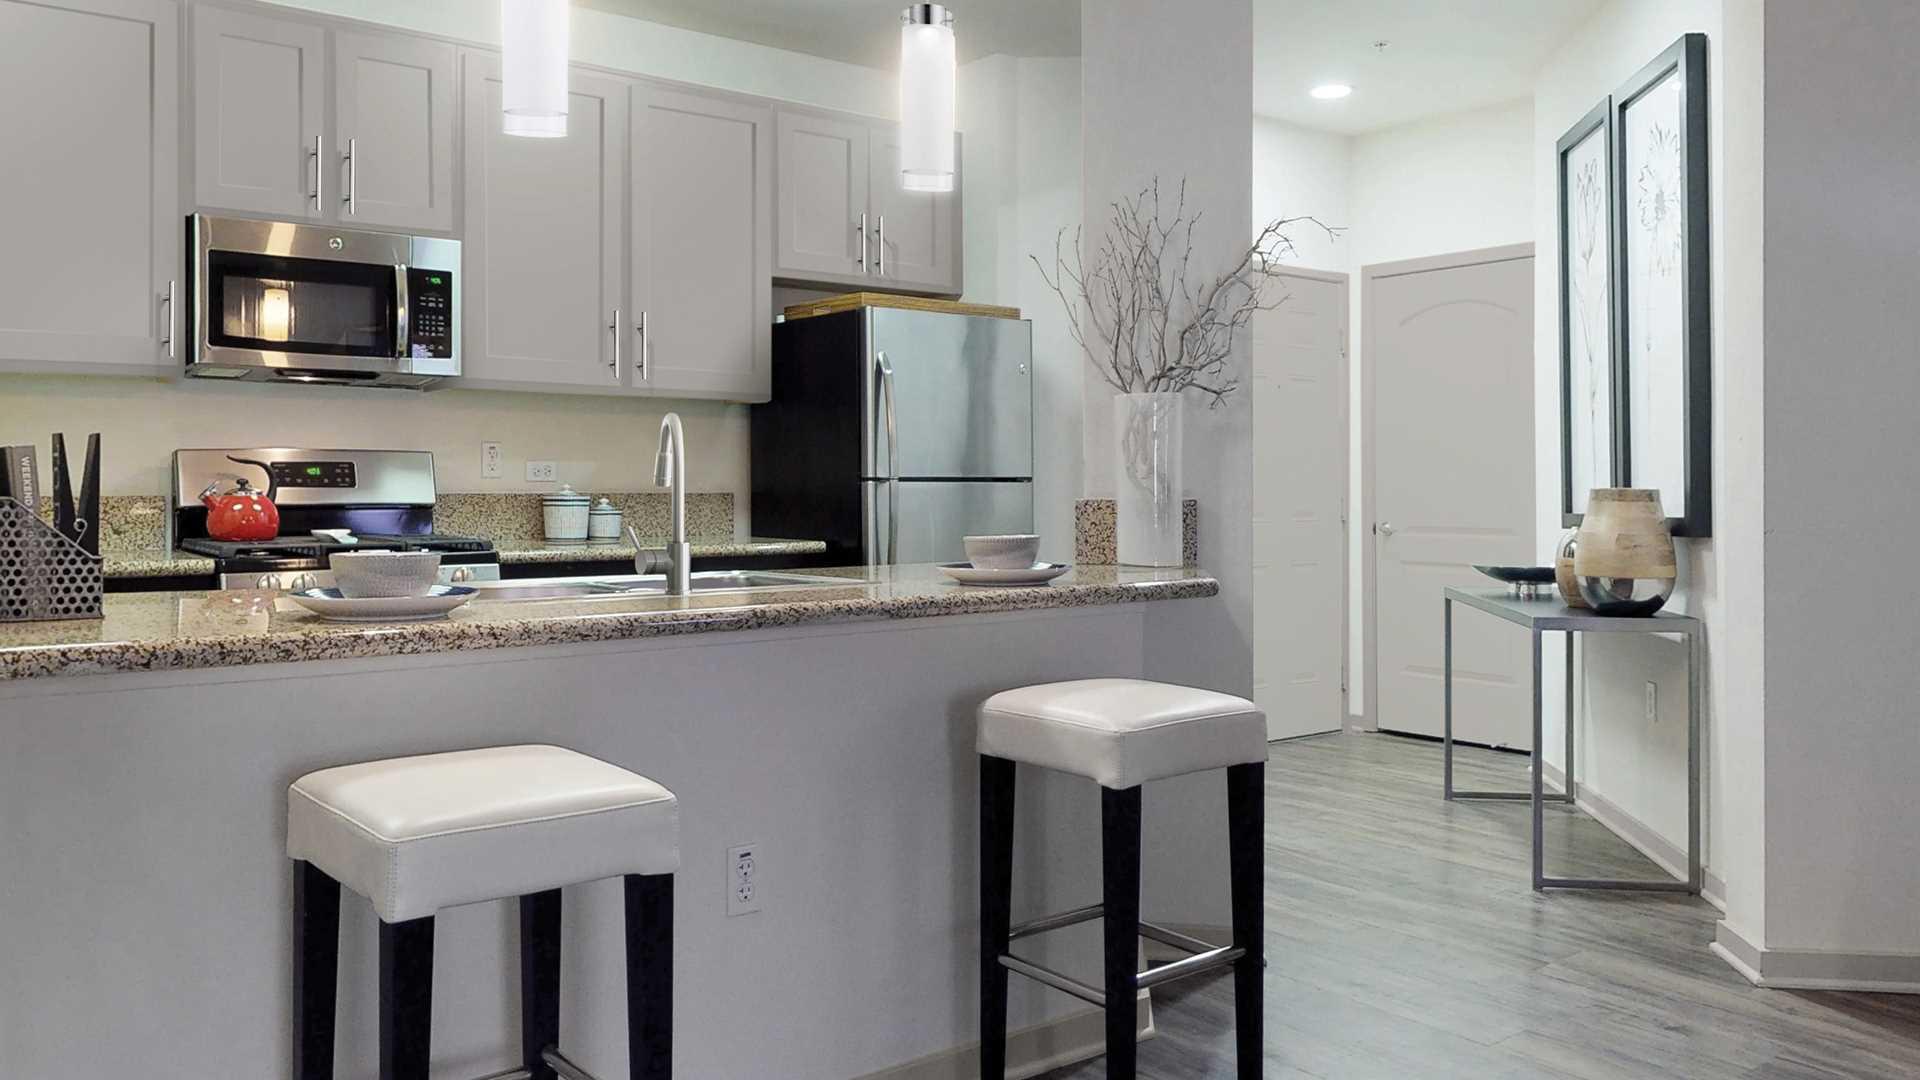 Terrific Mission Valley Apartments In San Diego Ca Mira Bella Download Free Architecture Designs Scobabritishbridgeorg